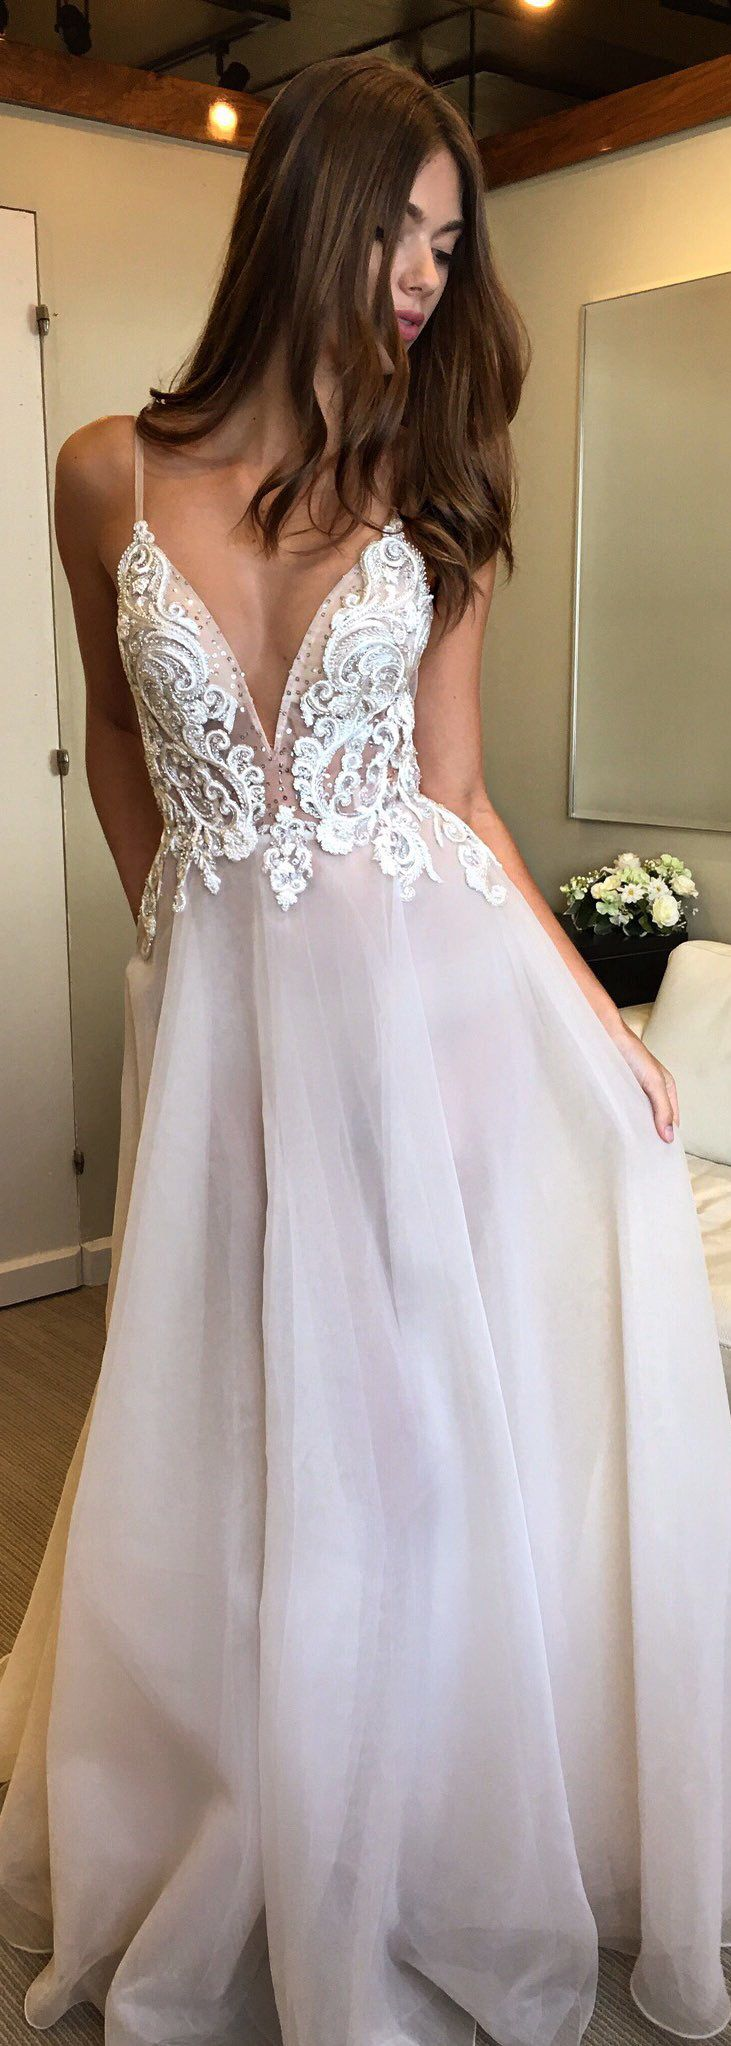 Semi formal dresses for wedding reception  Semi Formal Dresses  Wedding dress Wedding and Weddings